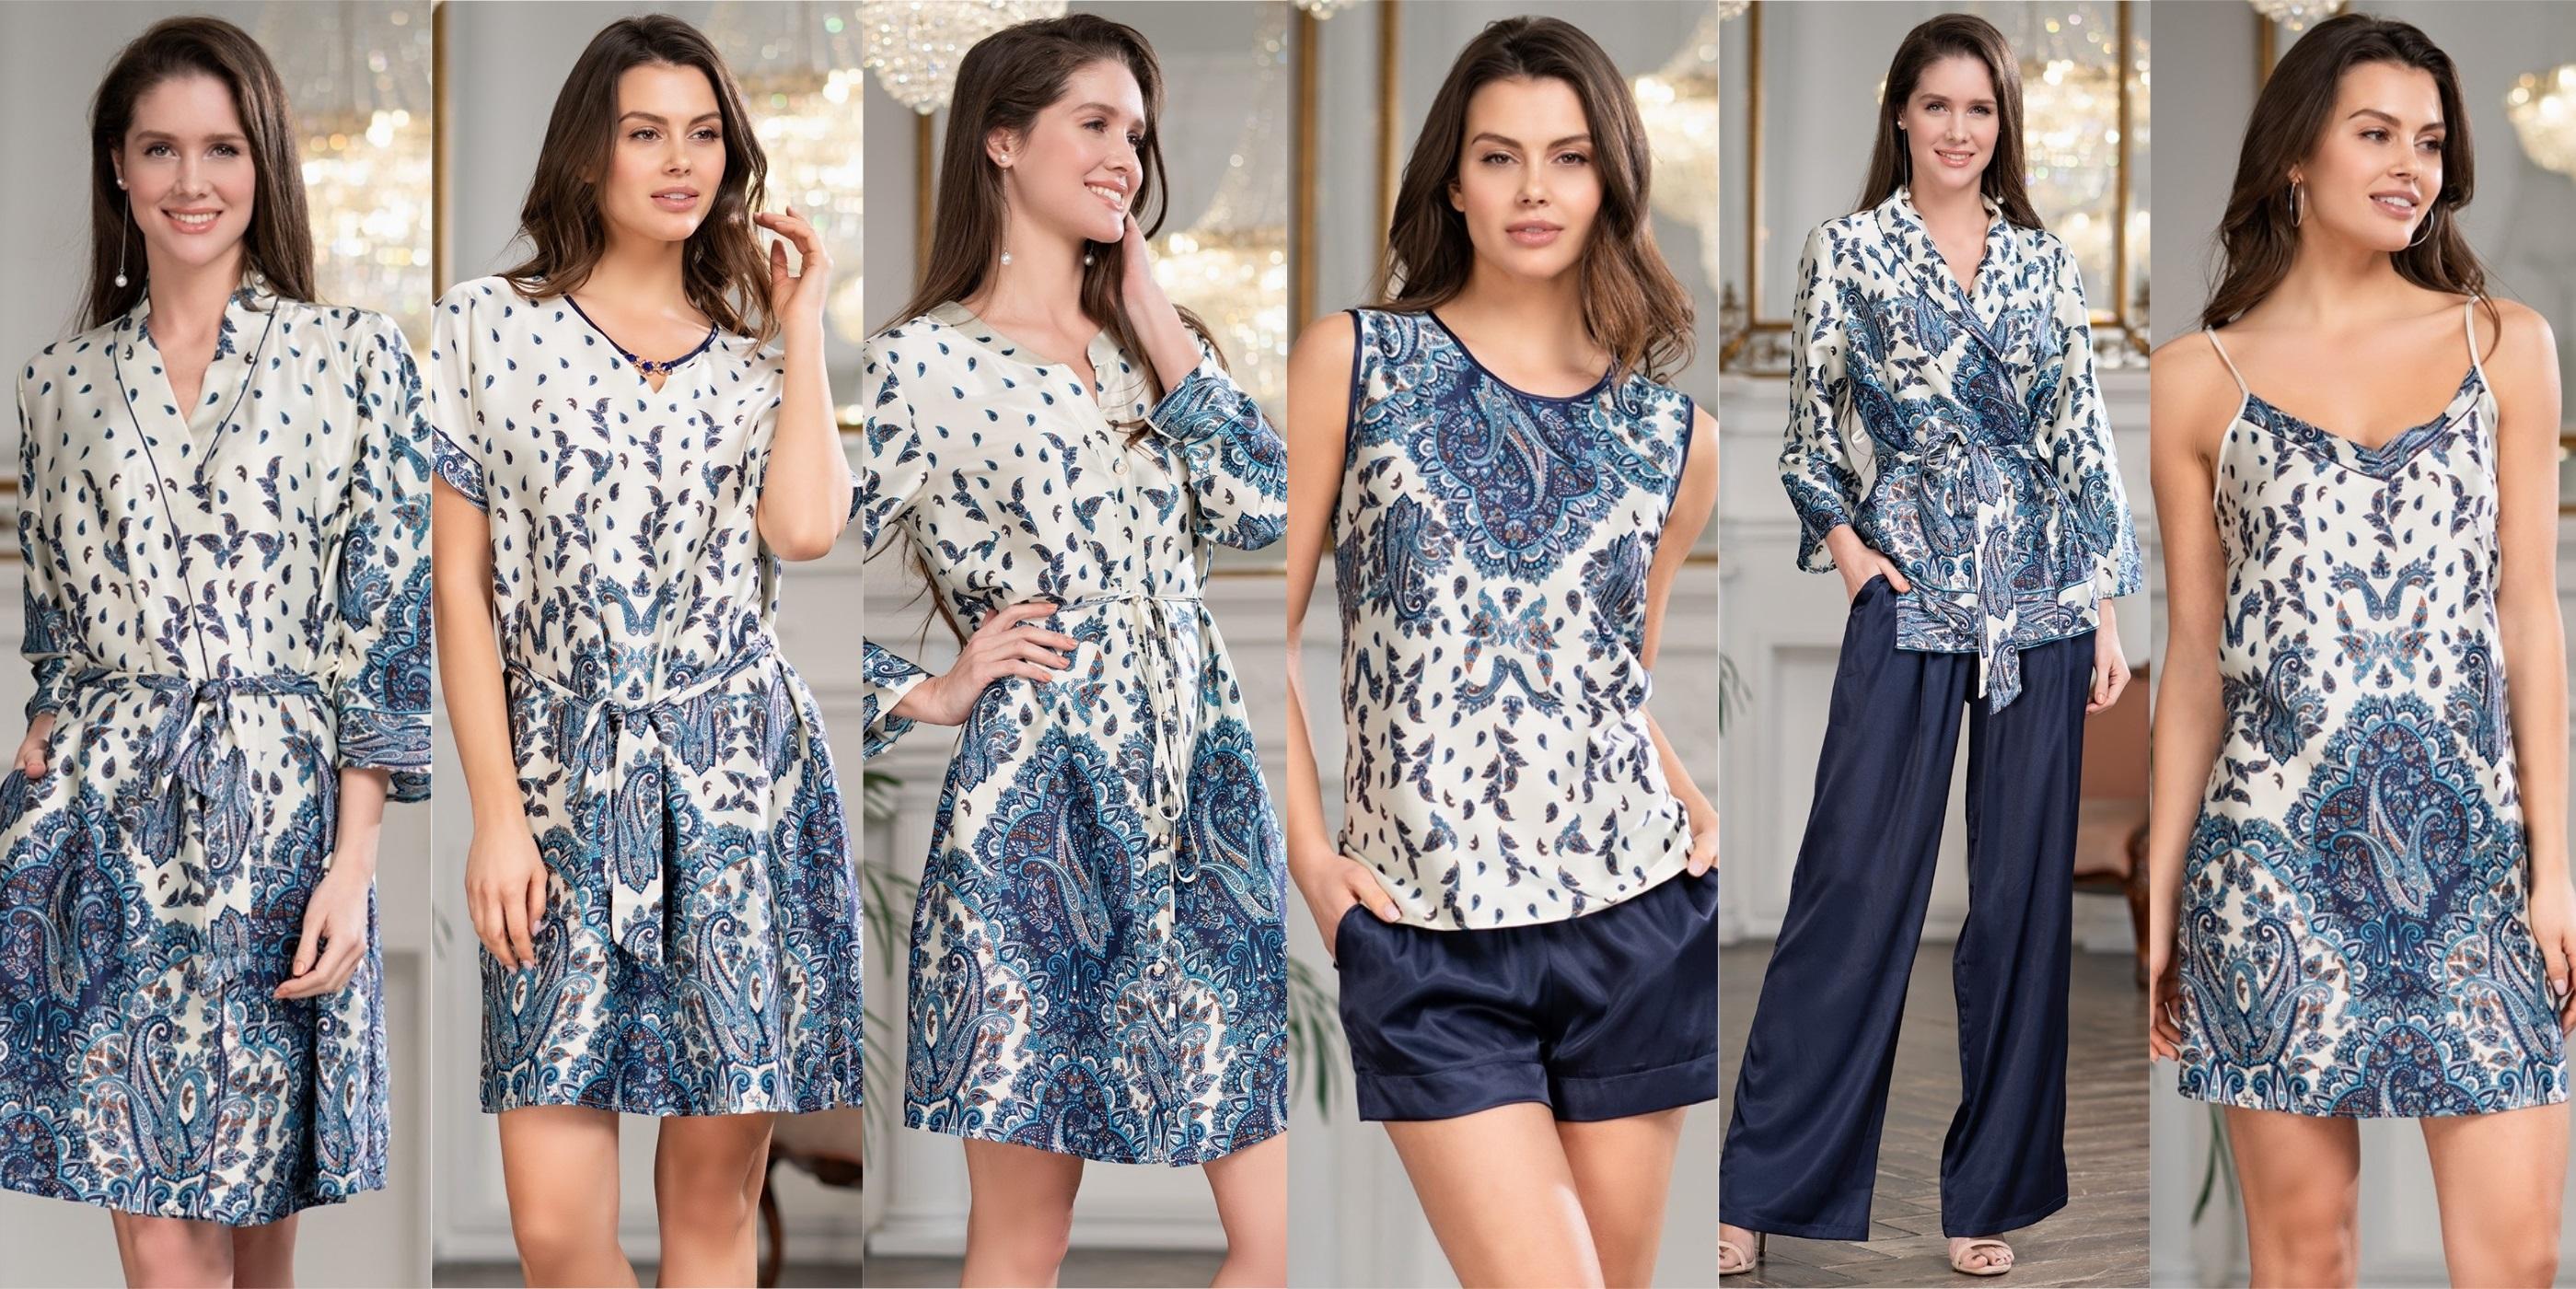 Халат, туники, сорочка, пижамы женские Mia-Mia купить